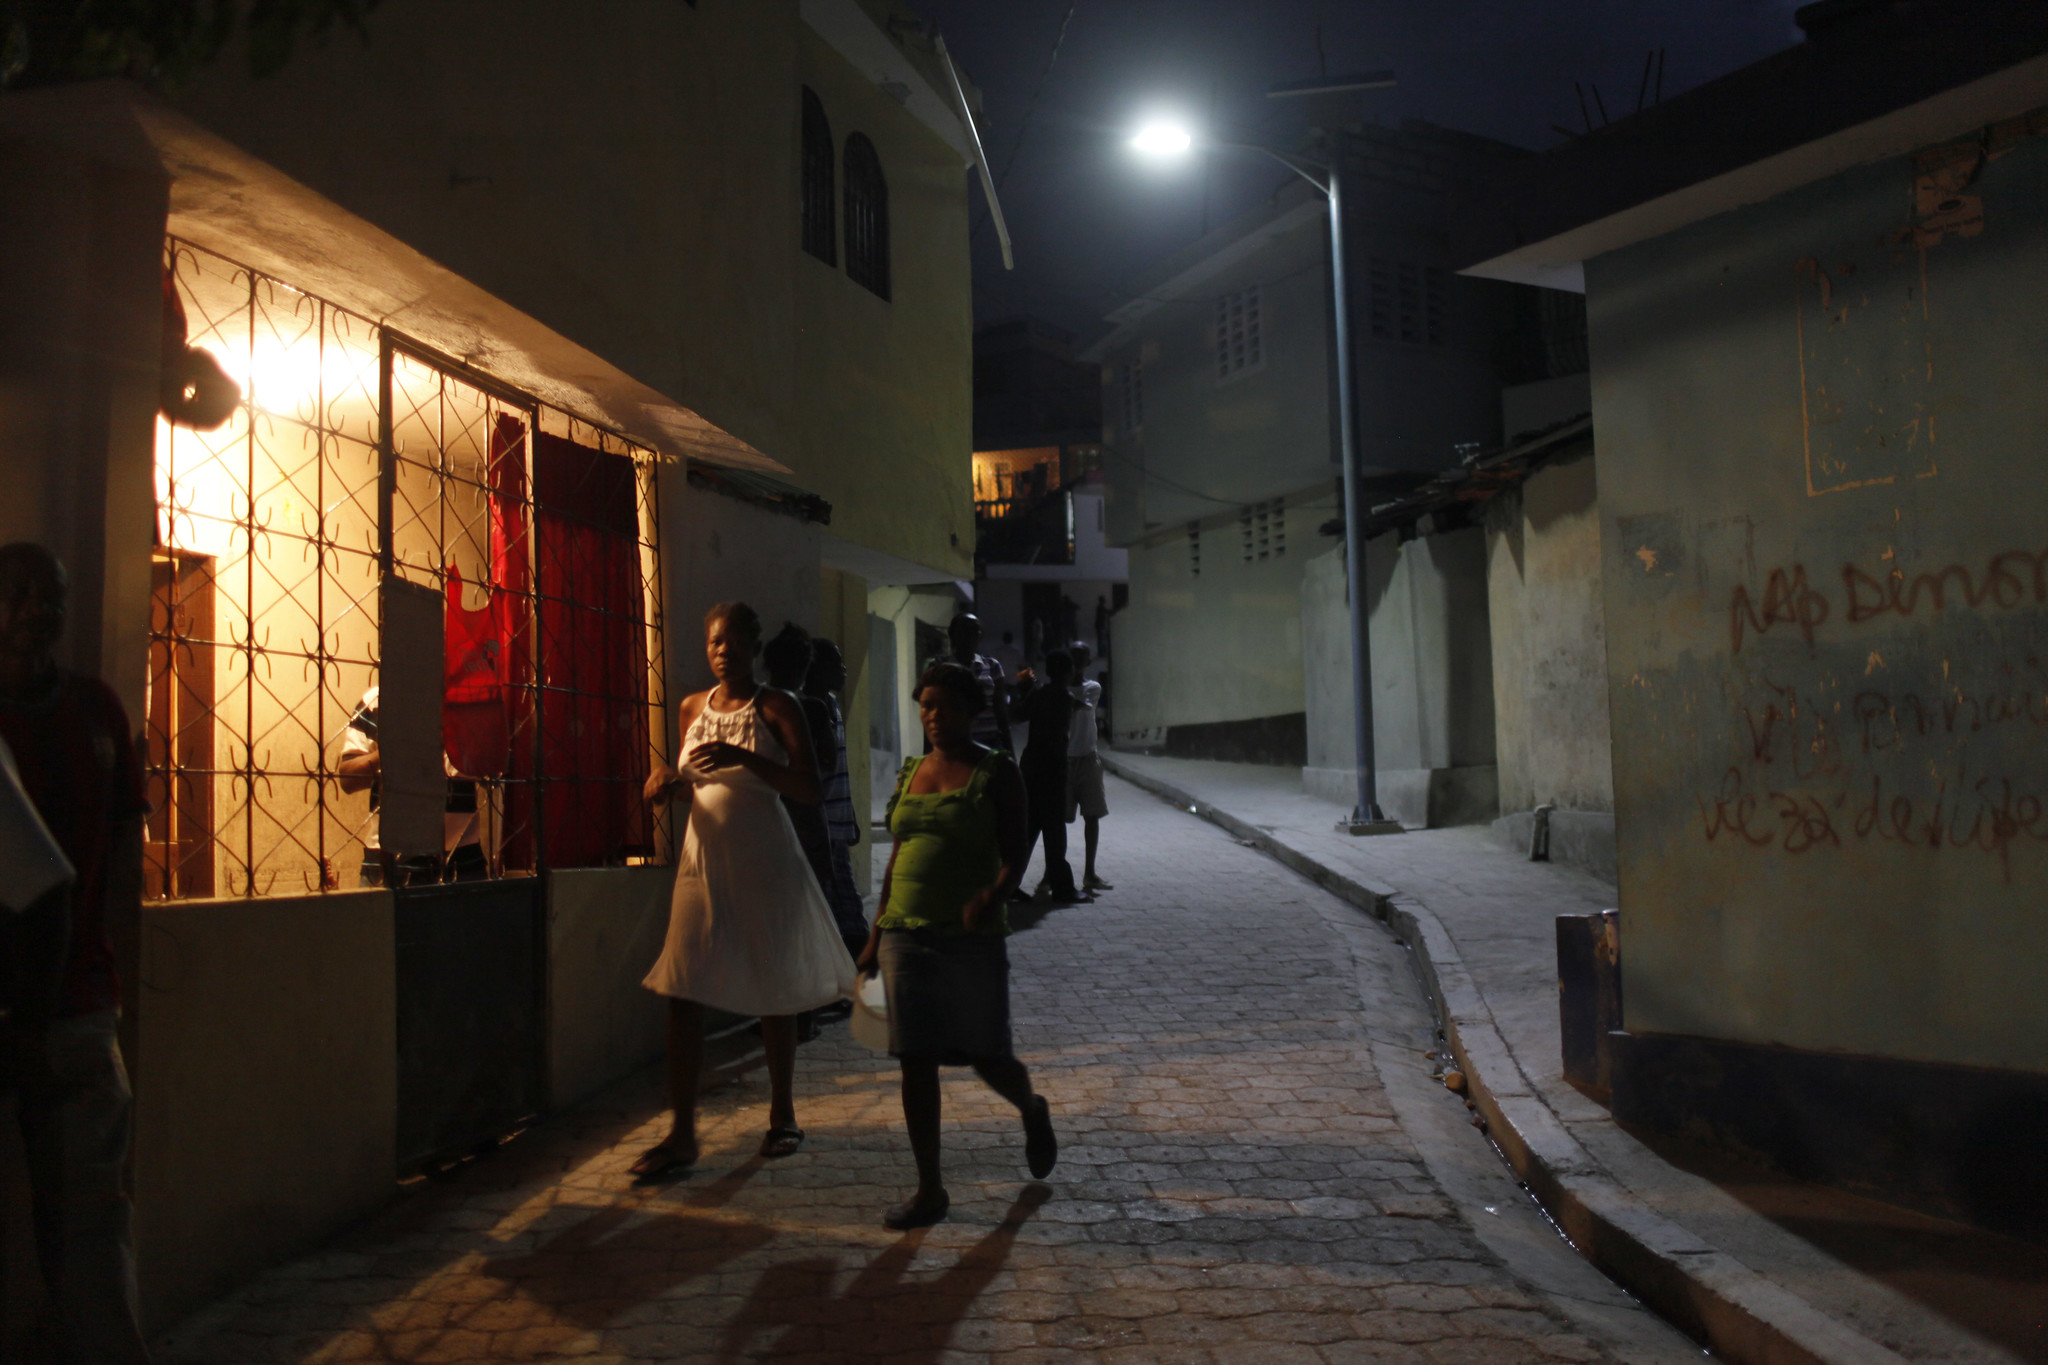 Electricity in the neighbourhood